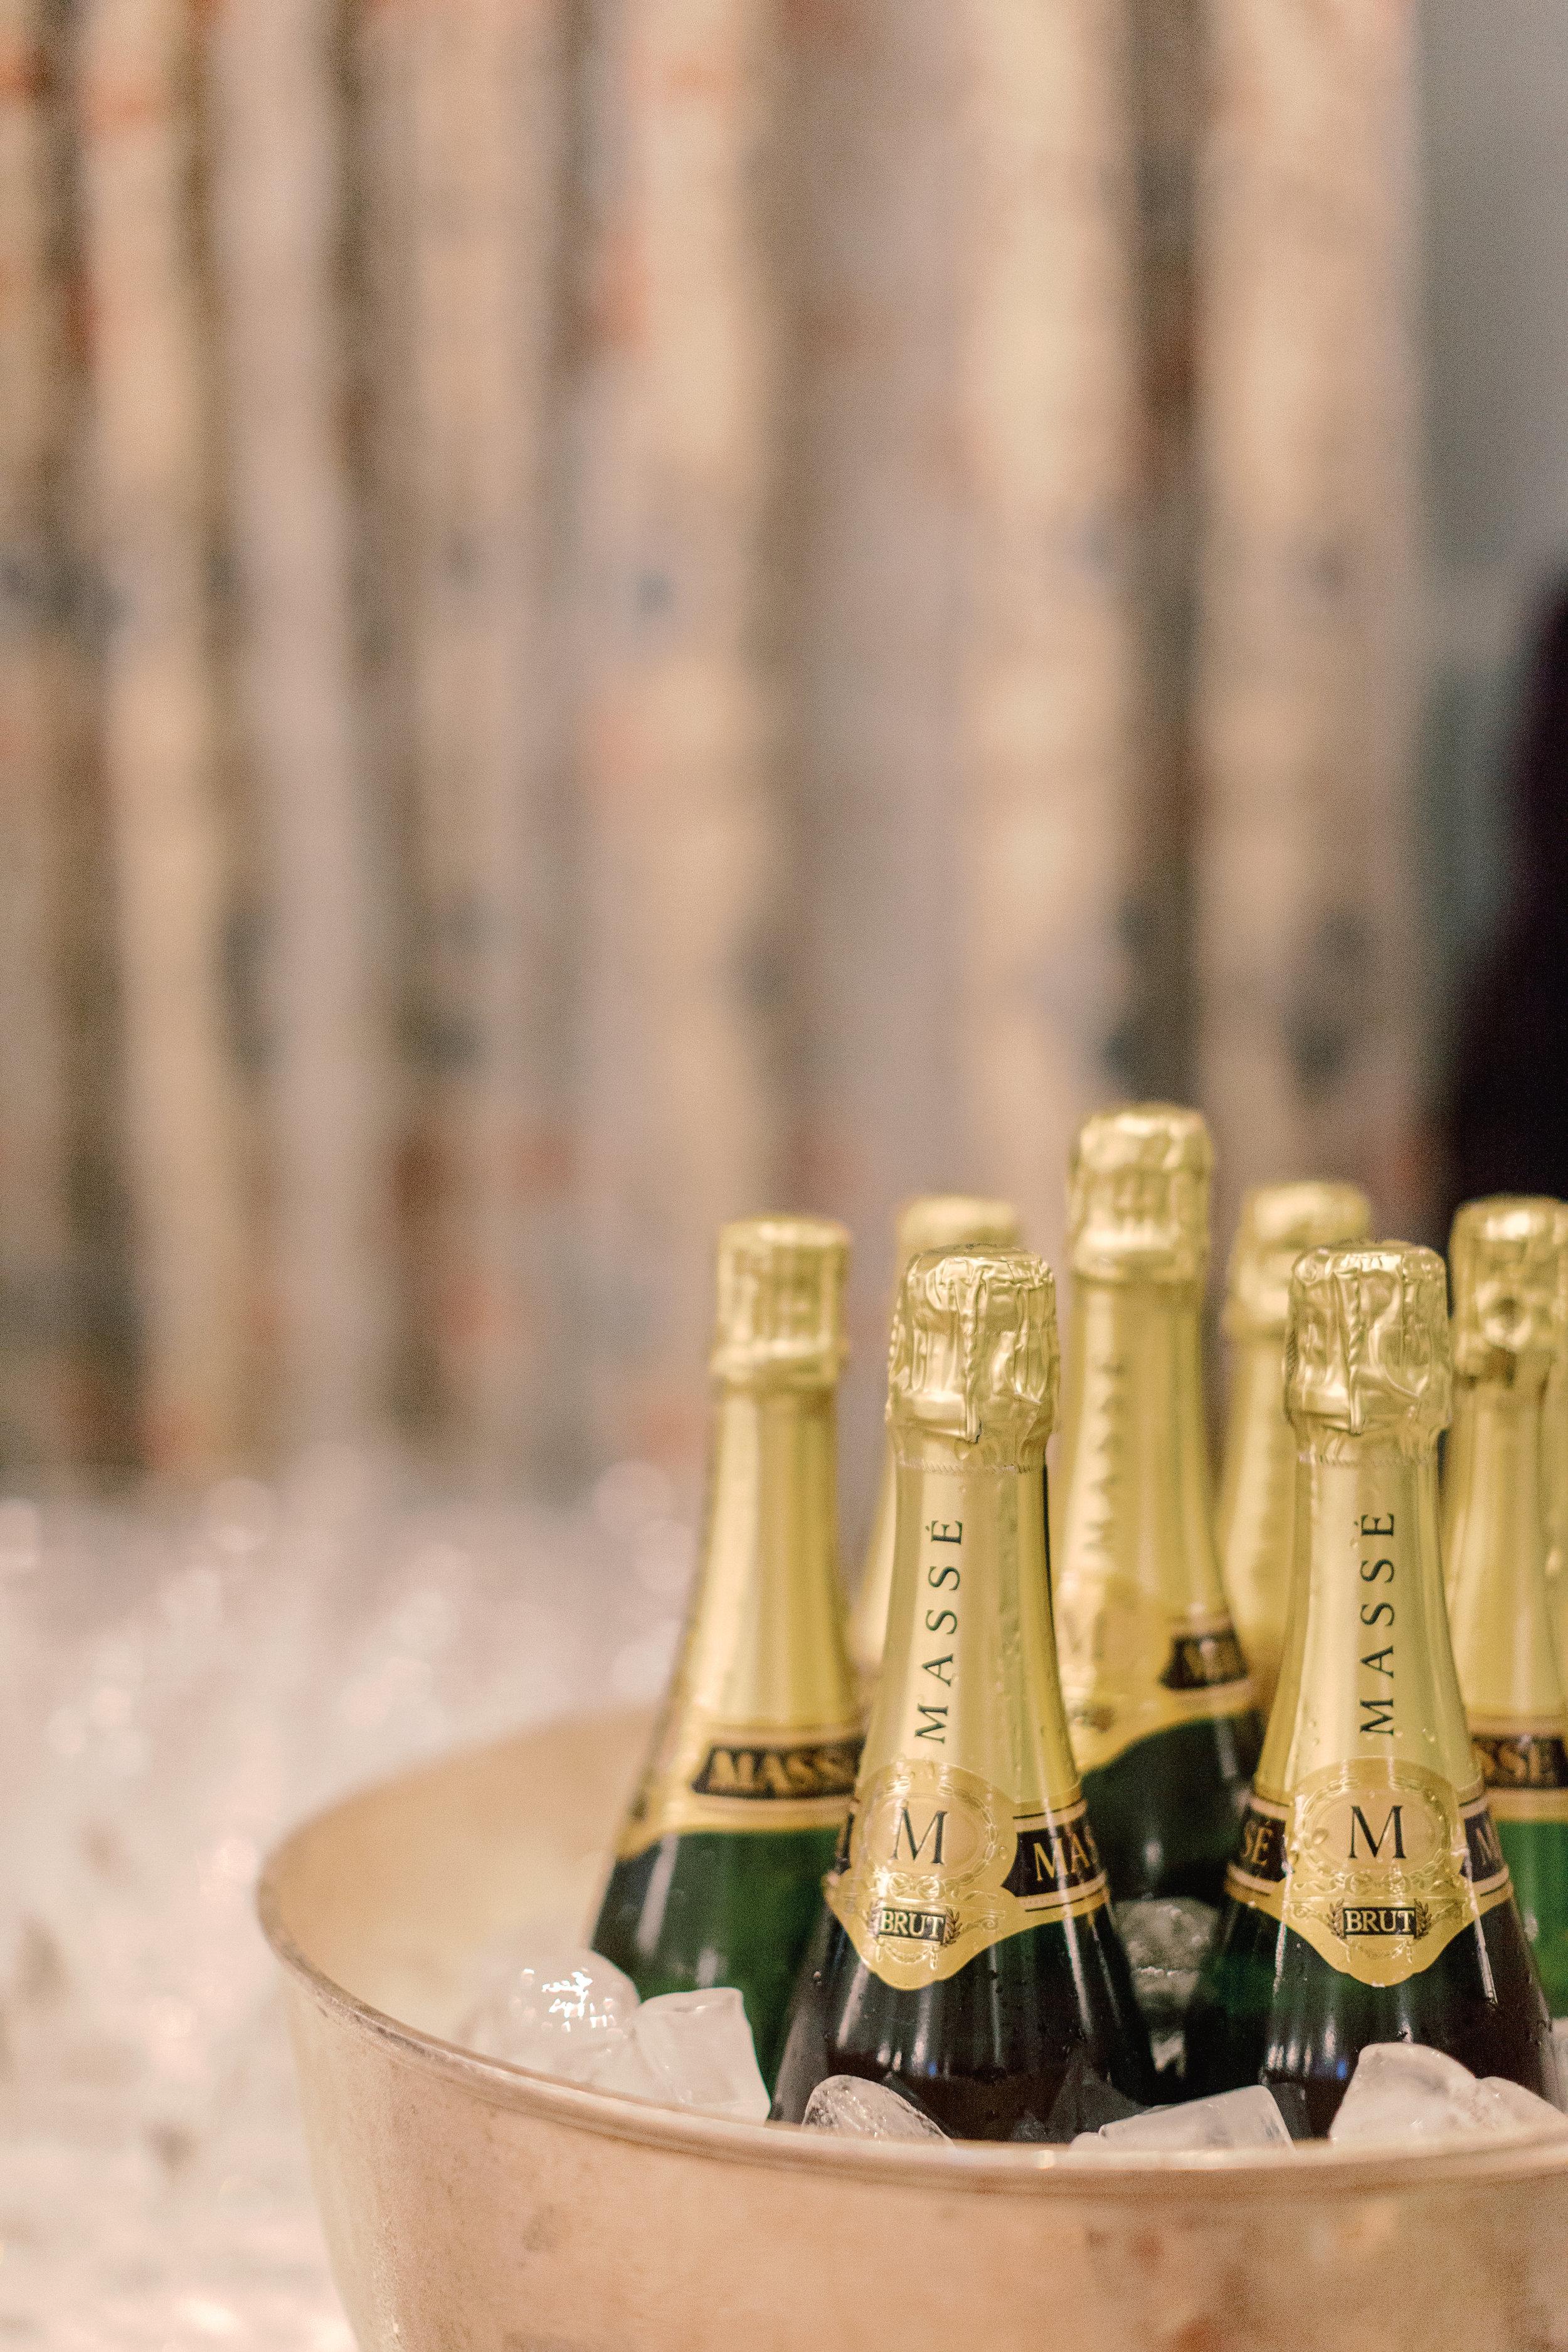 Luxury Wedding Planner | Lily & Sage | Cotswolds Wedding Planner | English Wedding | Experts+Guide+-+Wedding+Wine+Image.jpg